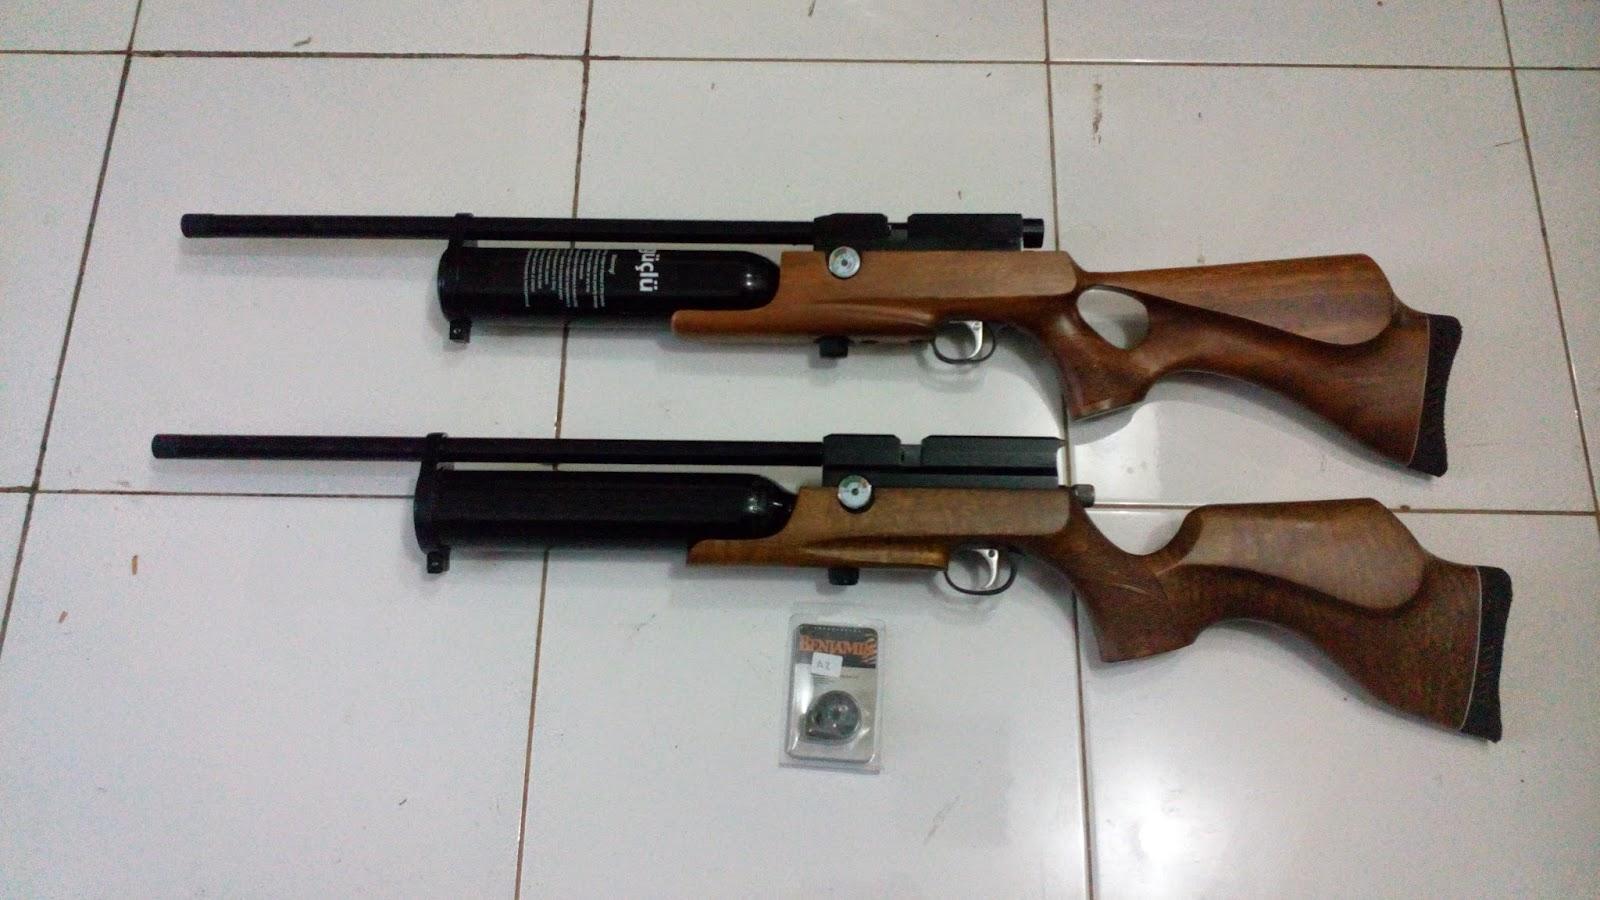 GUNS AND HOBBIES: March 2015